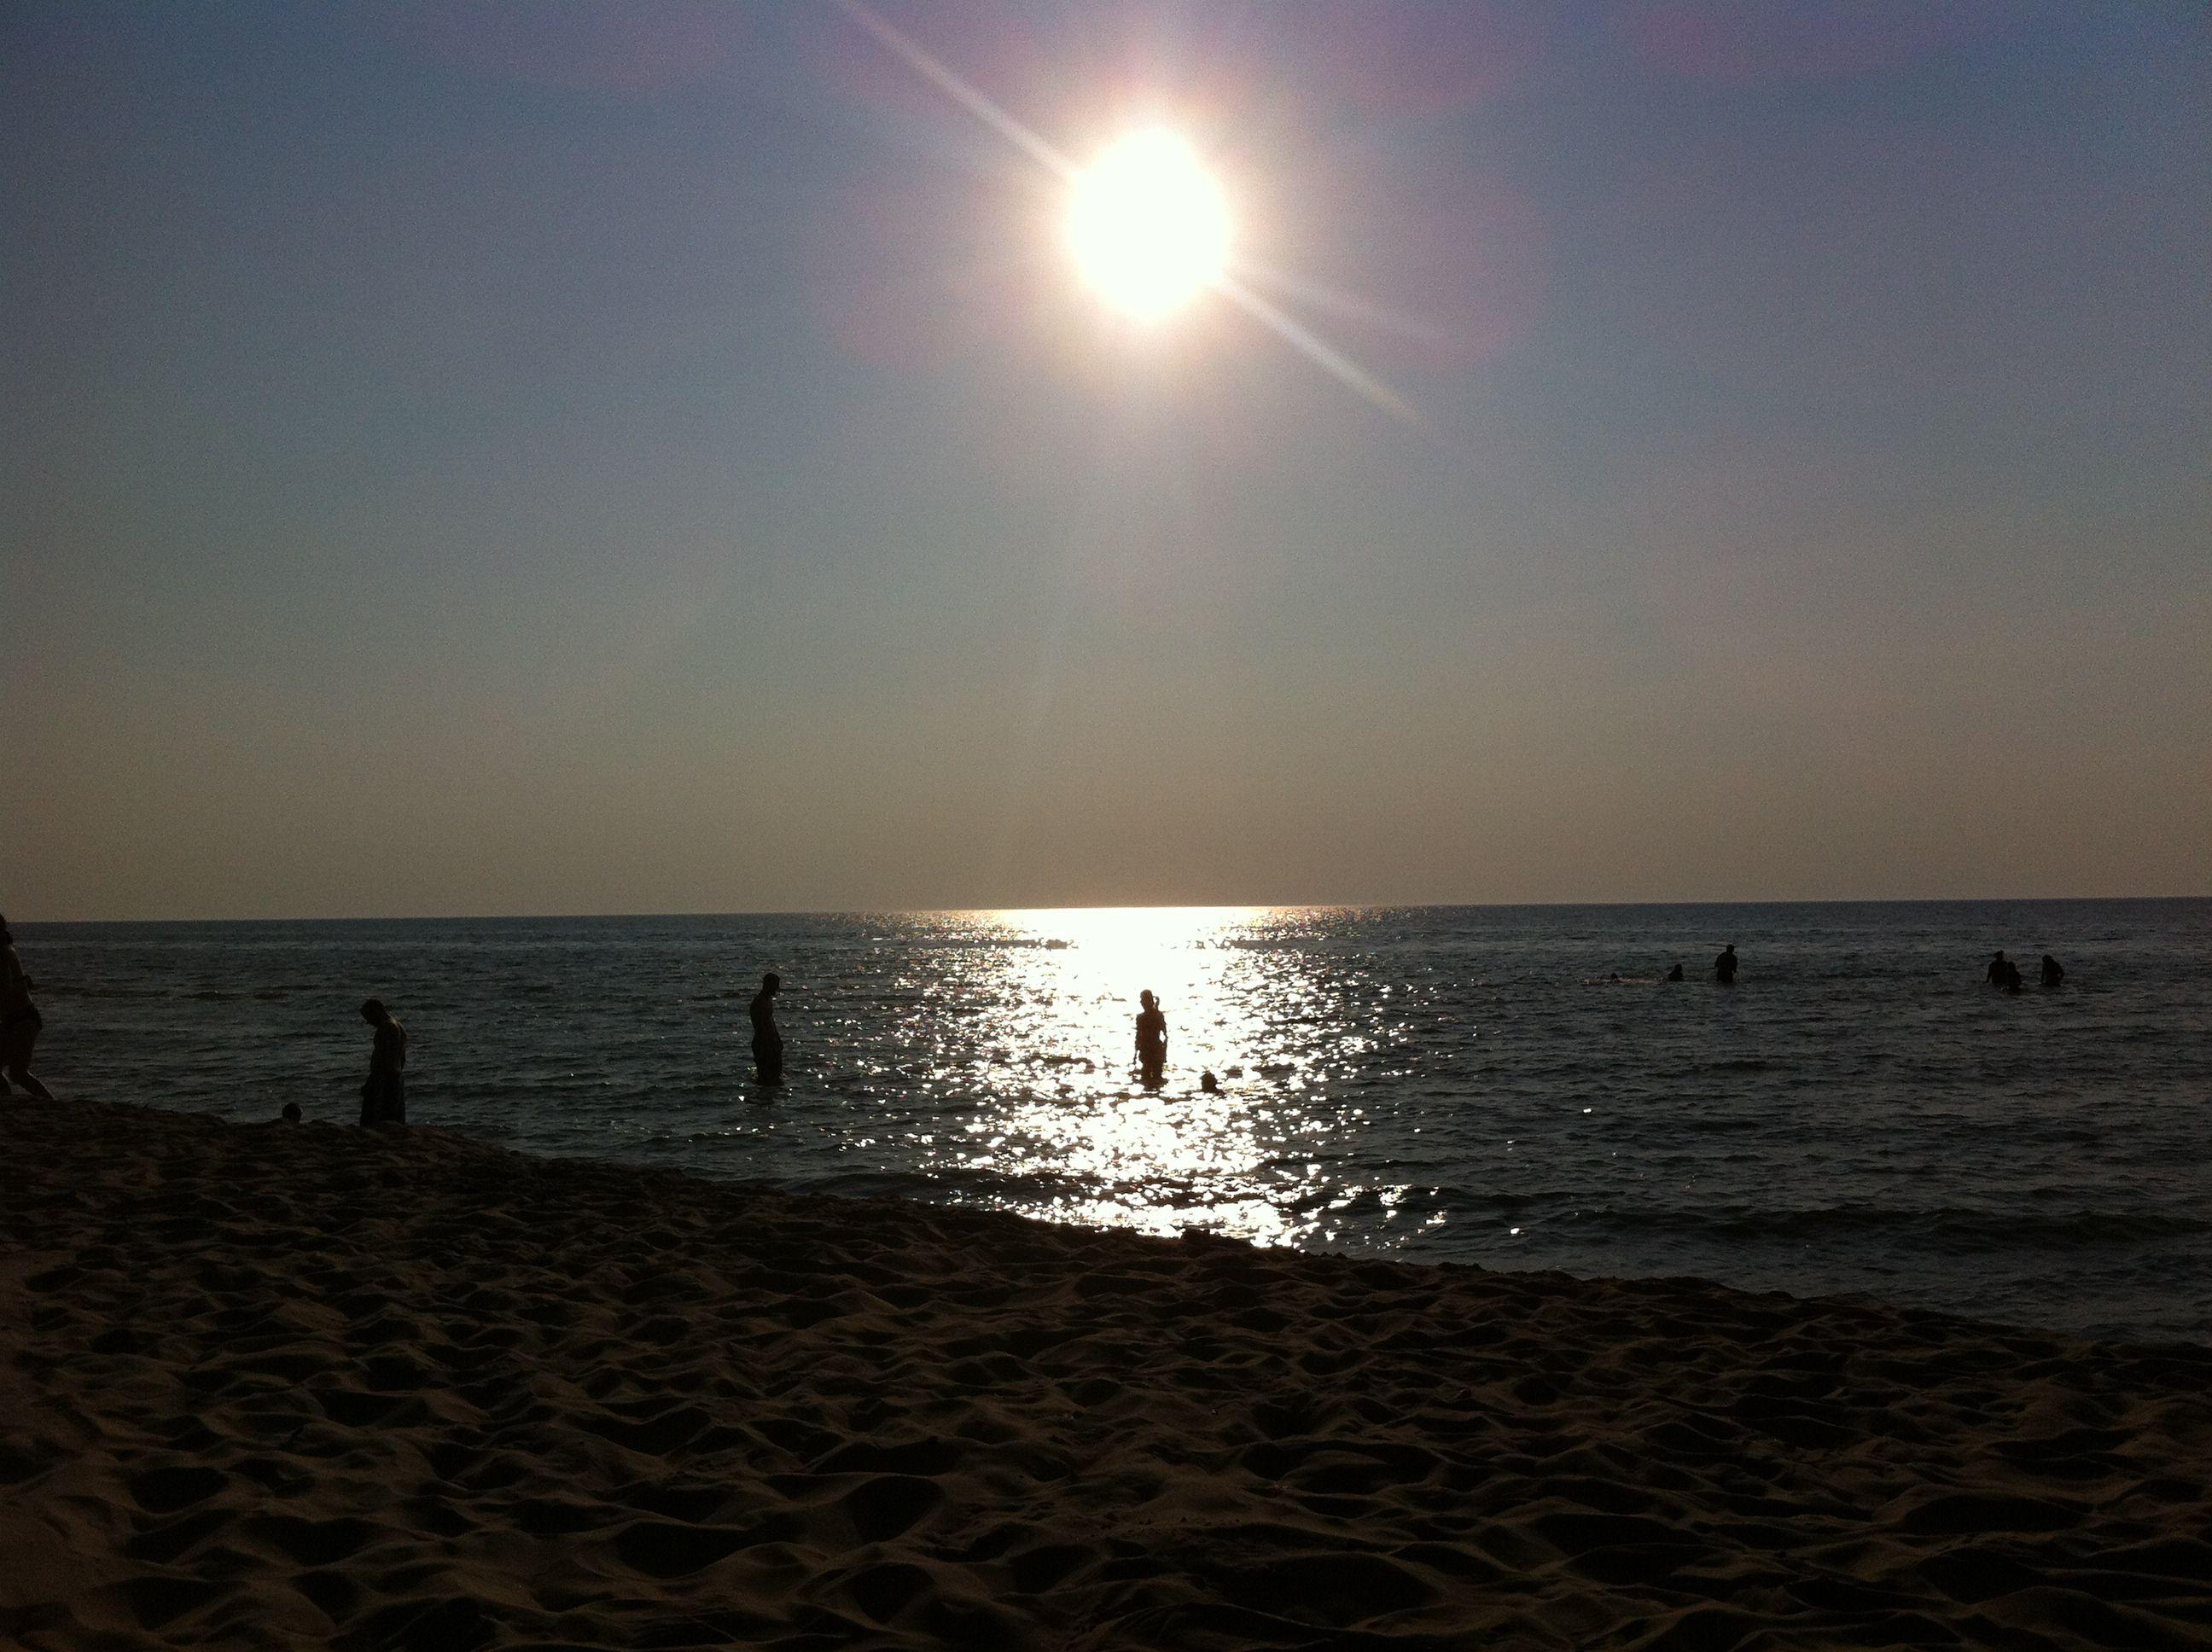 The gorgeous sunset on lake michigan